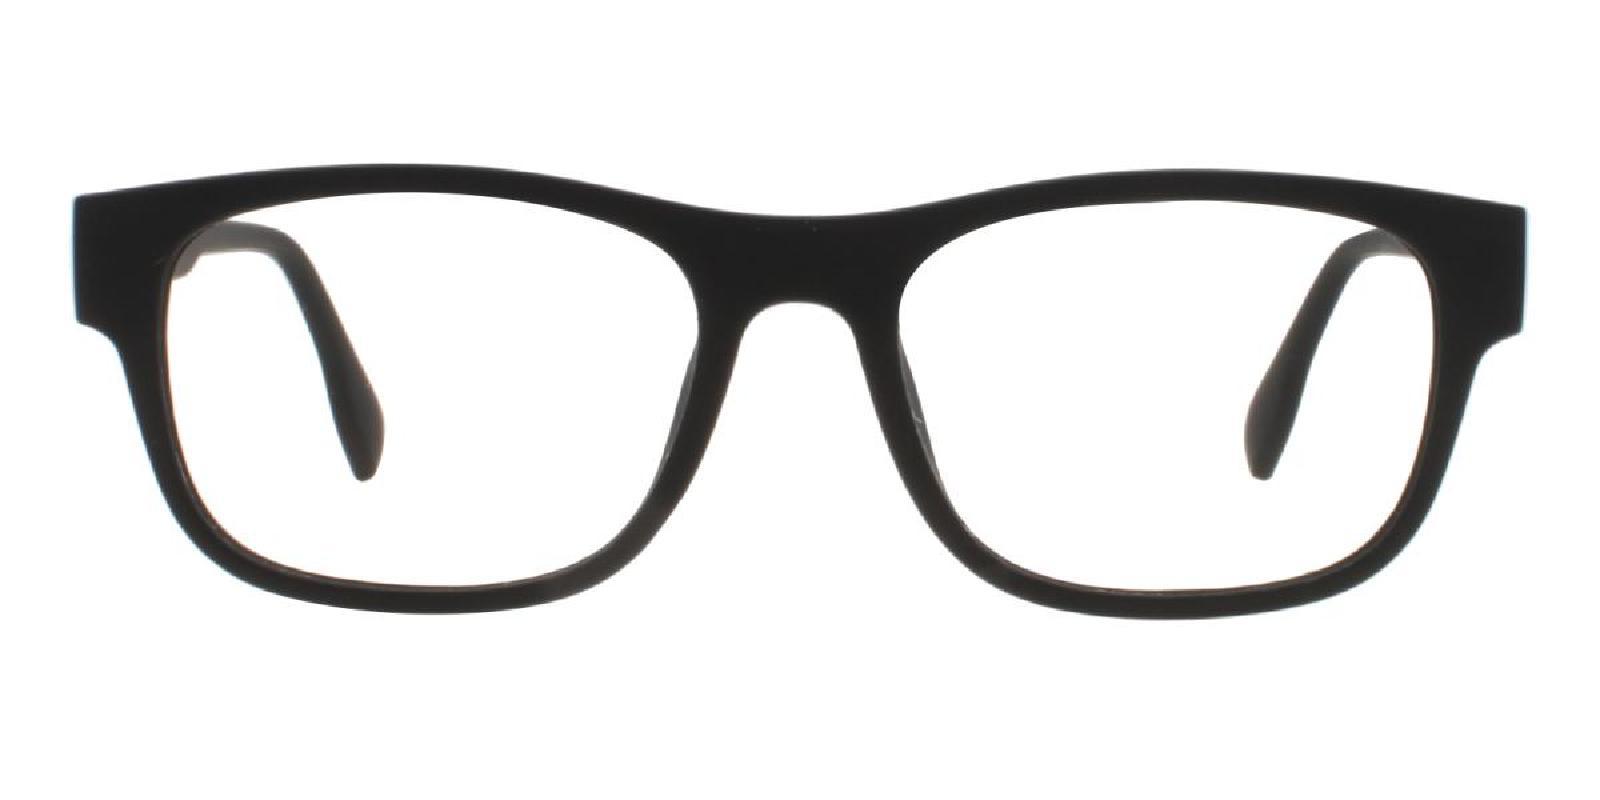 Richmond-Black-Rectangle-TR-Eyeglasses-additional2